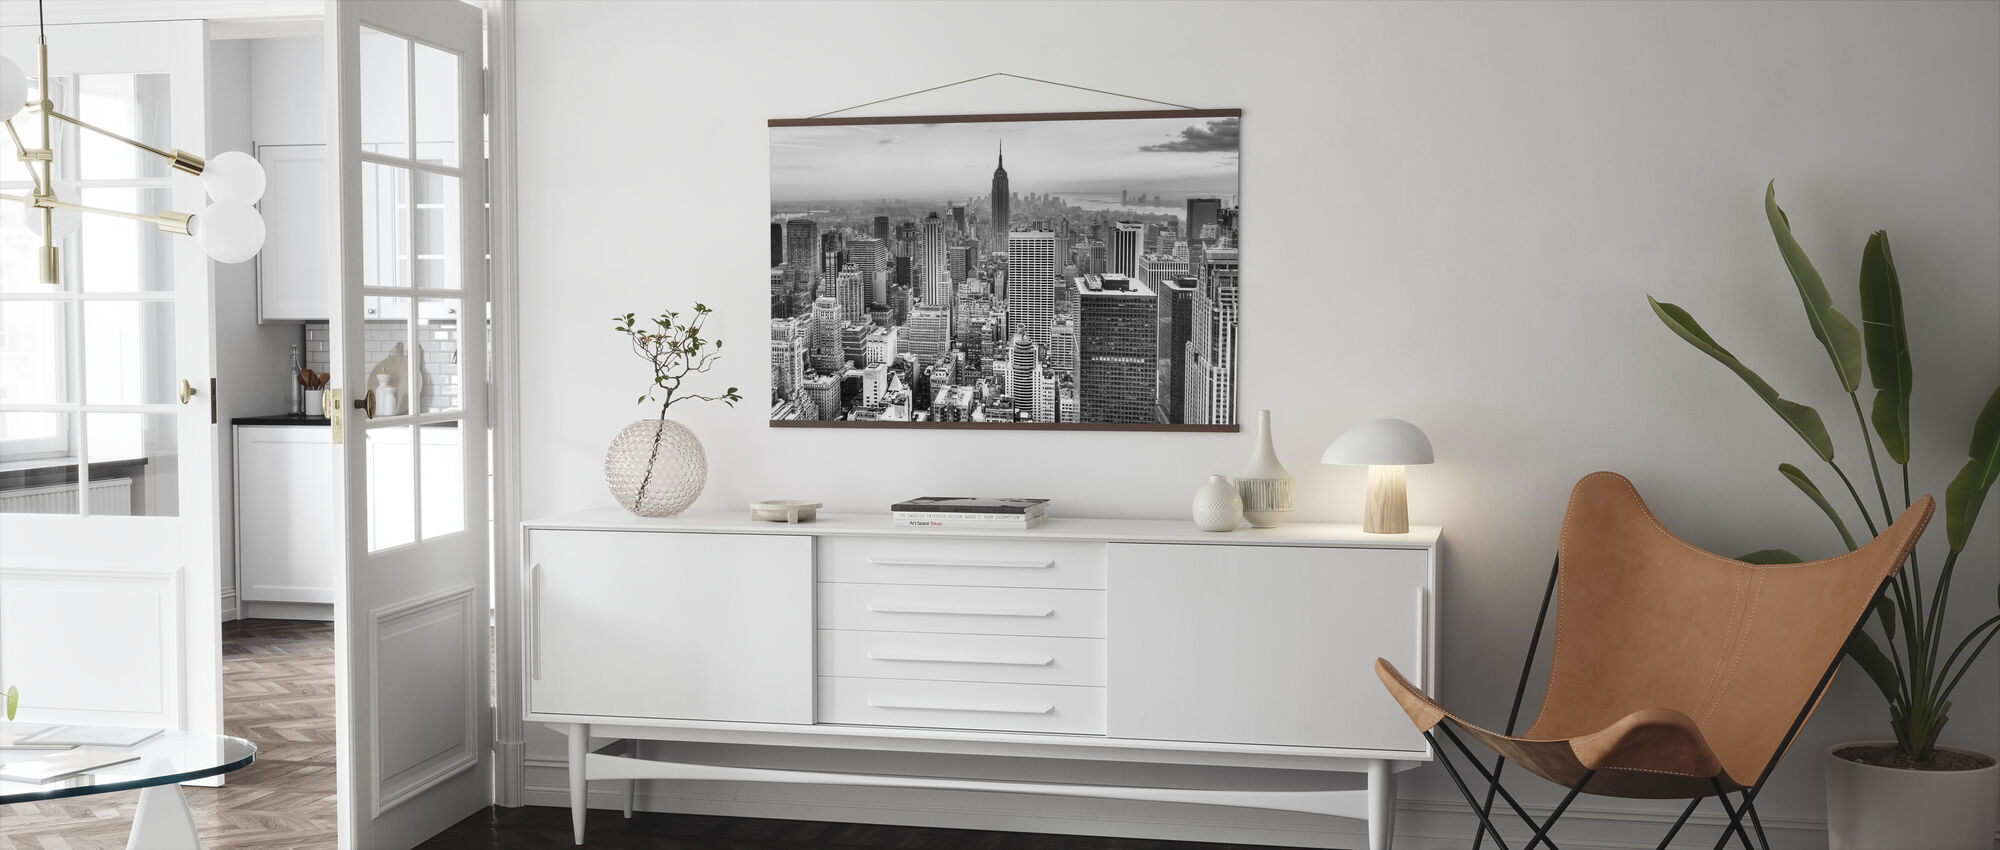 New York City 3 - Poster - Living Room